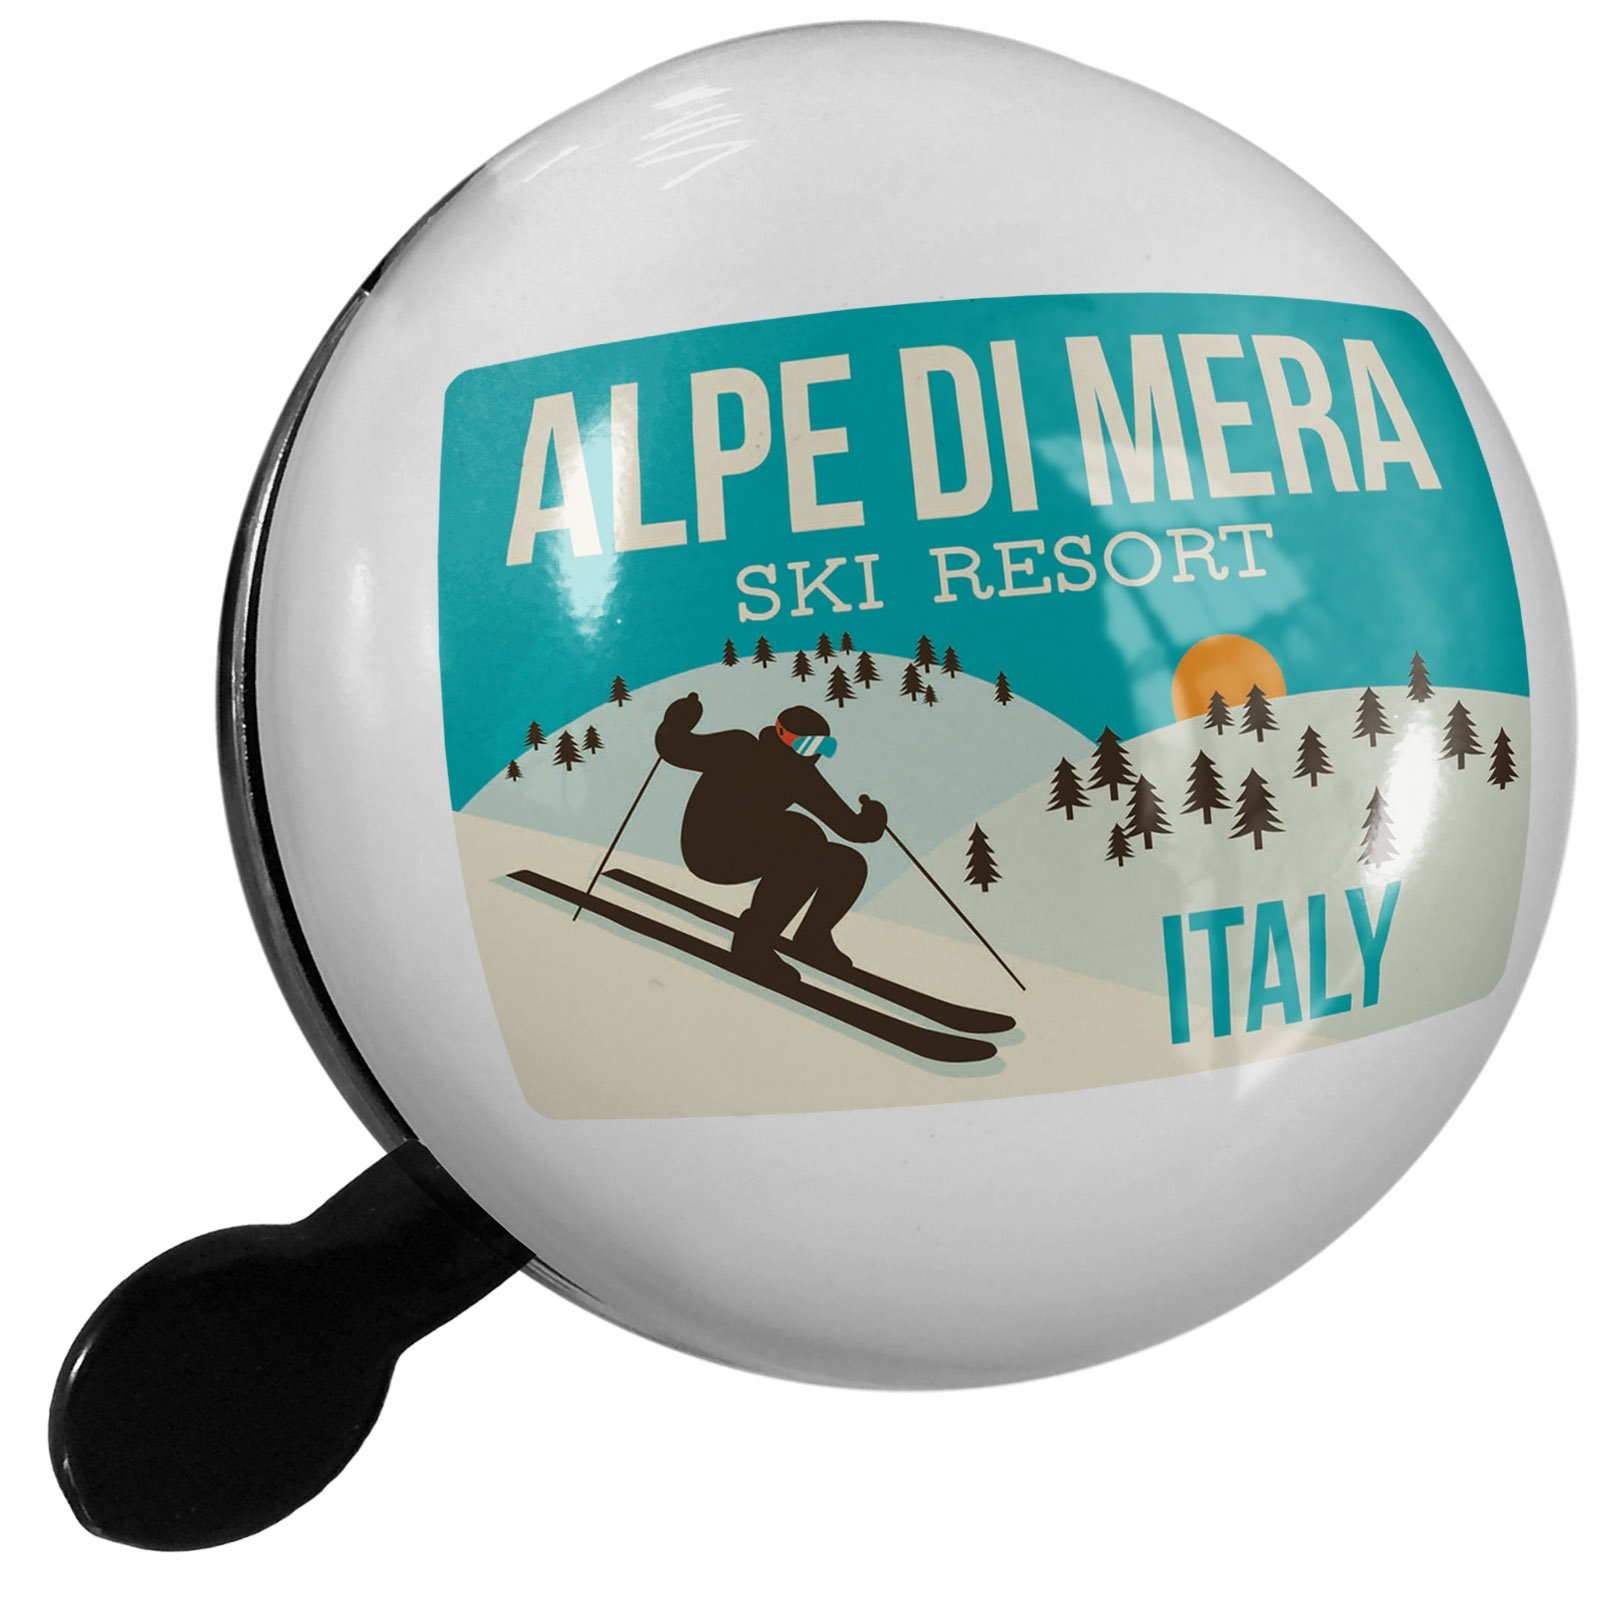 Small Bike Bell Alpe di Mera Ski Resort - Italy Ski Resort - NEONBLOND